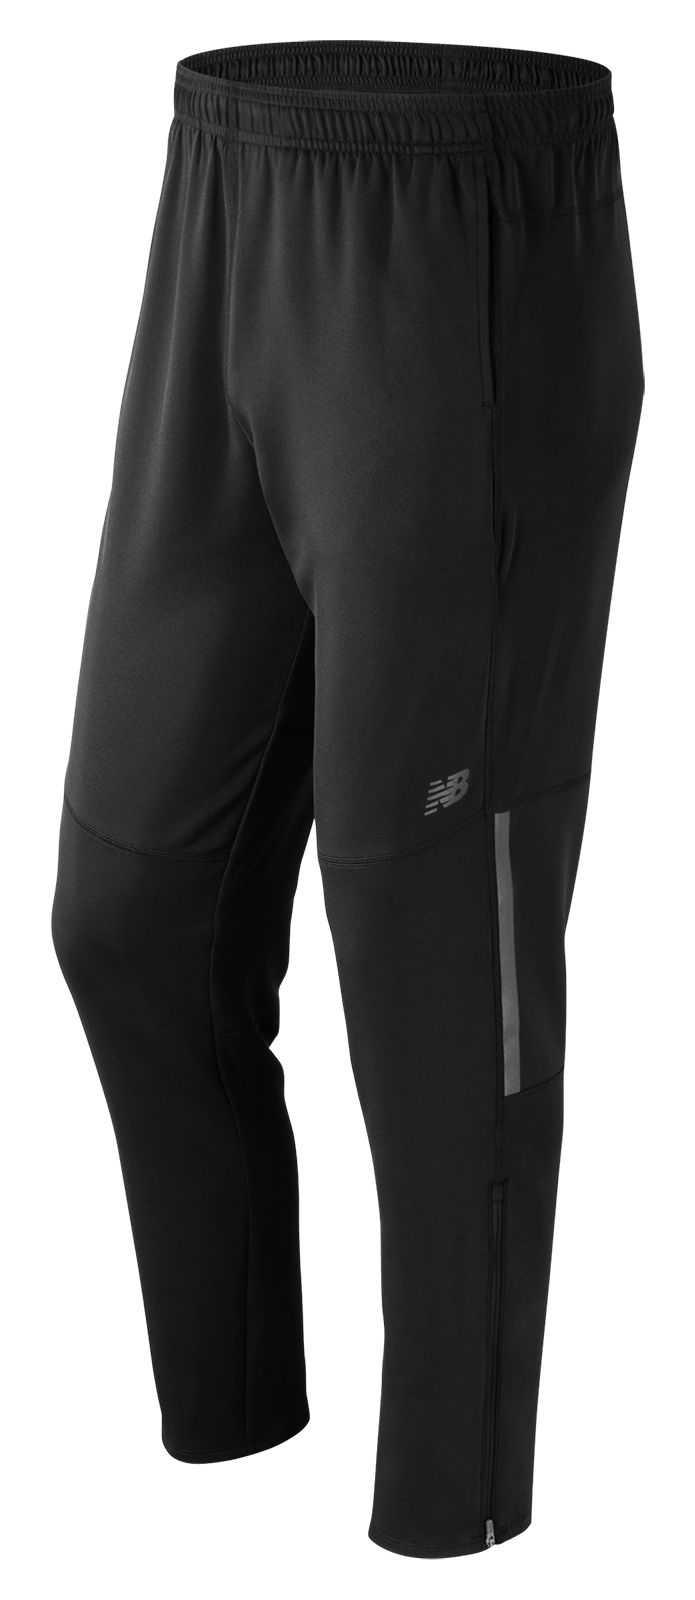 New Balance : Gazelle Pant : Men's Pants : MP53040BK